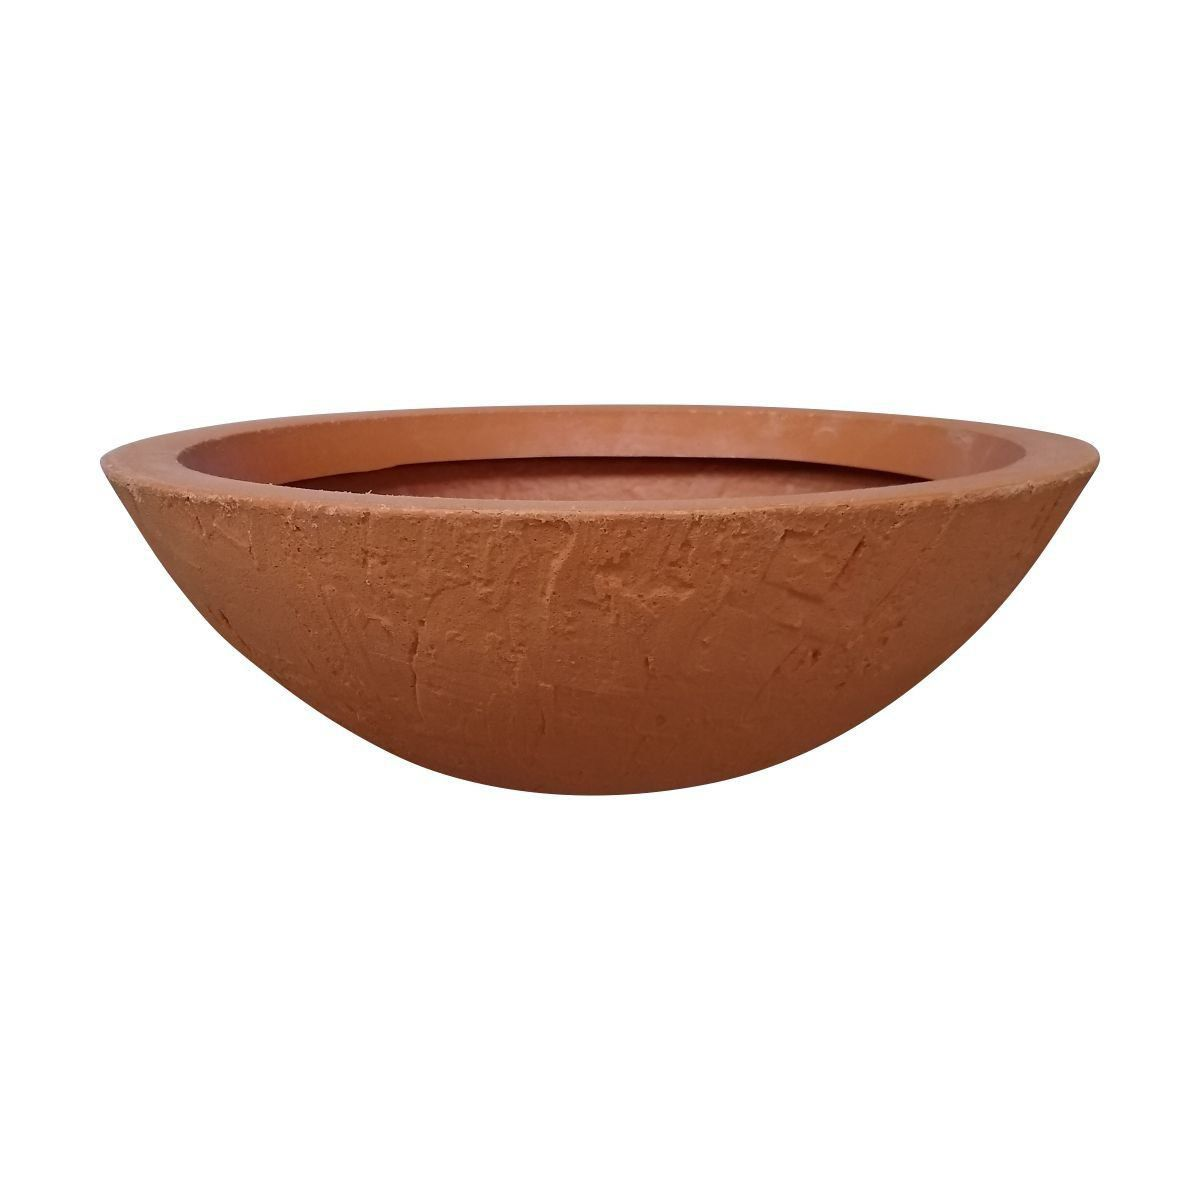 Vaso Bacia Rústica Médio cor Terracota 17cm x 52cm - 6755